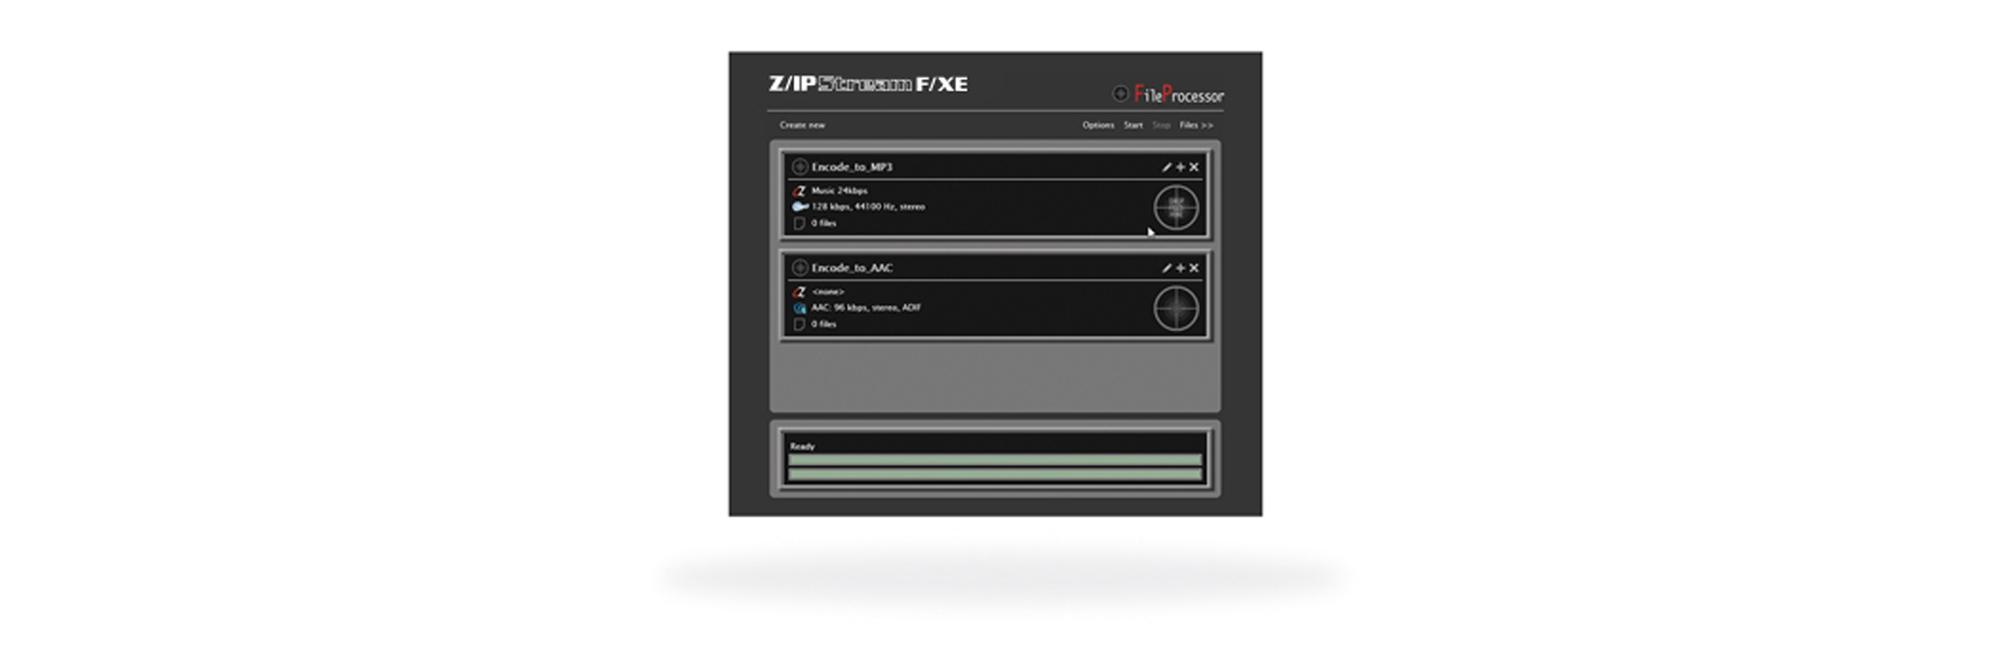 Telos Z/IPStream F/XE